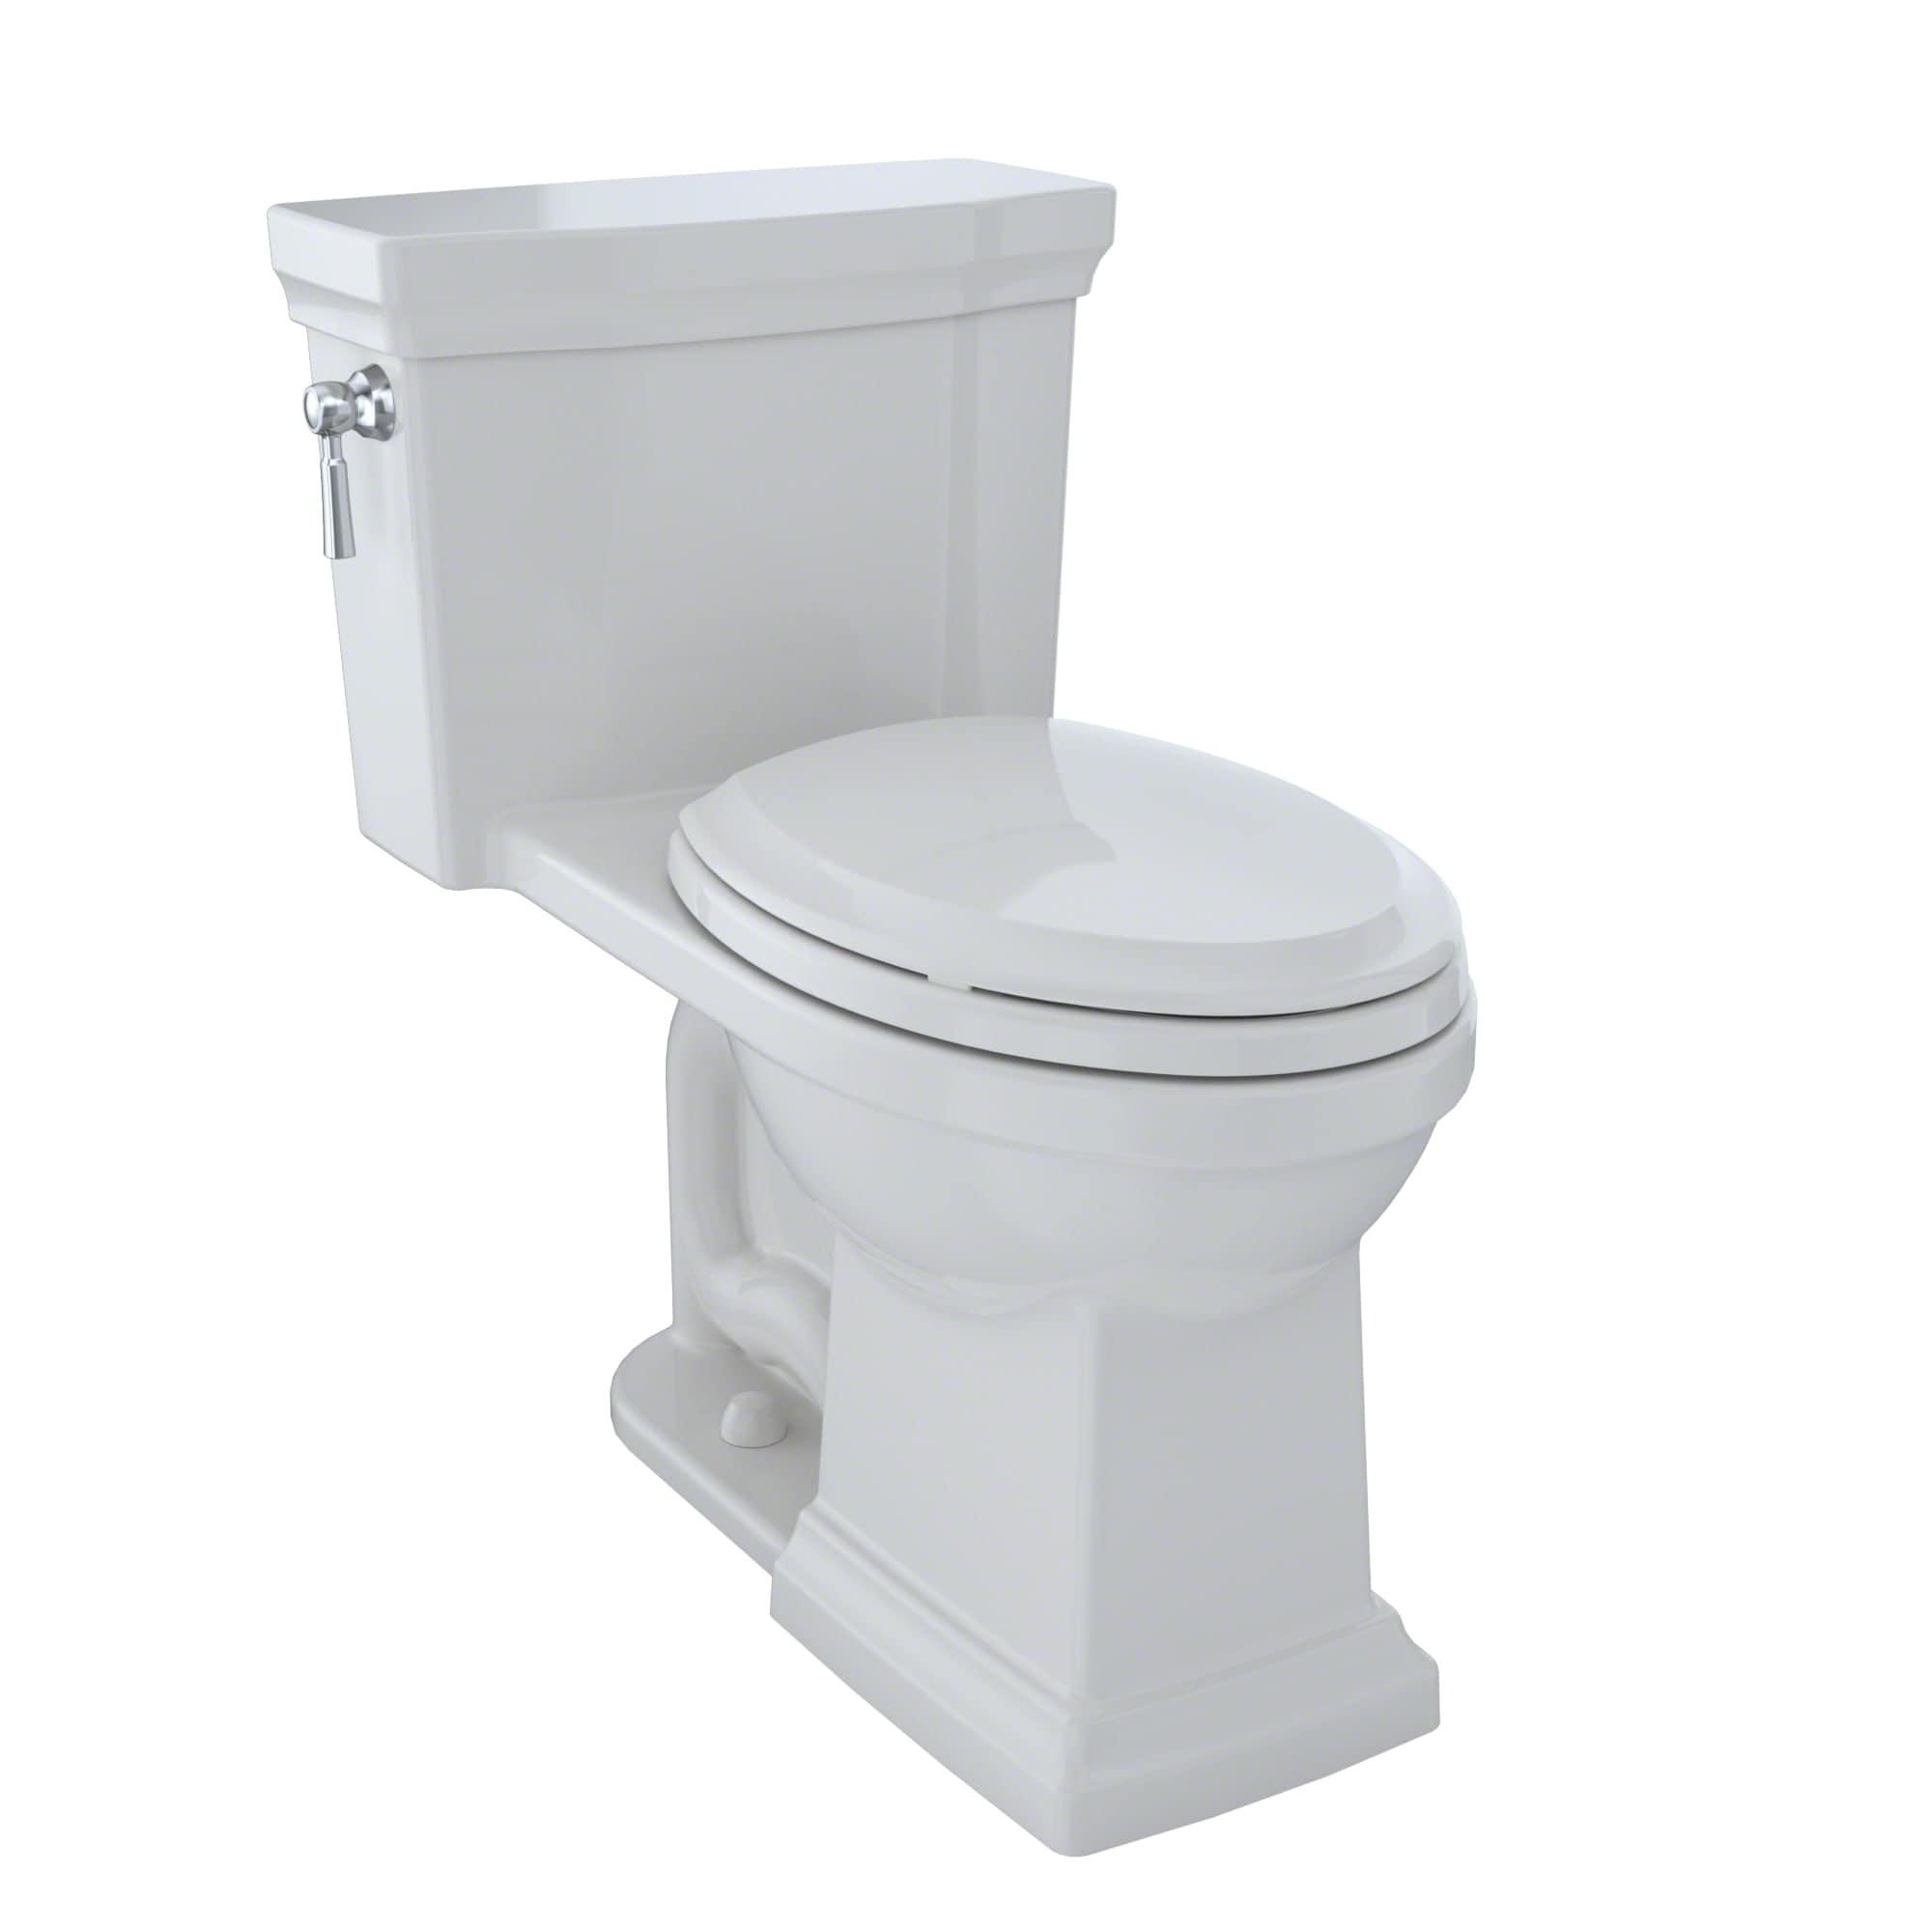 Shop Toto Promenade II One-Piece Toilet, 1.28 GPF MS814224CEFG#11 ...